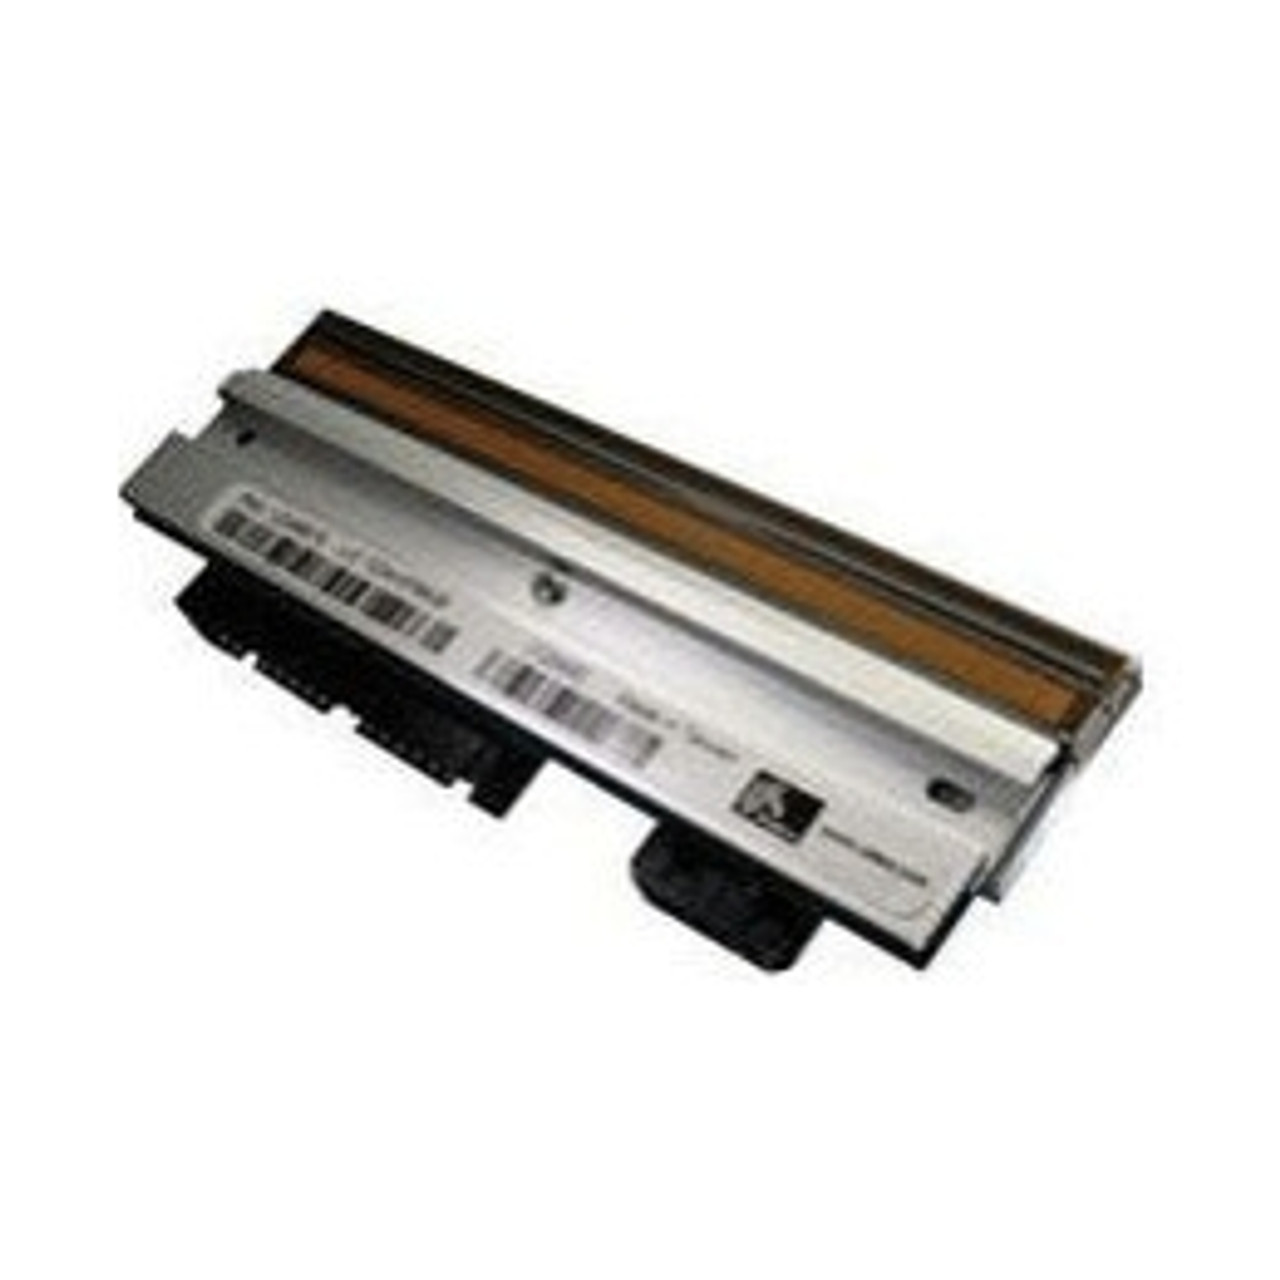 TTP 8000 Printheads & Parts